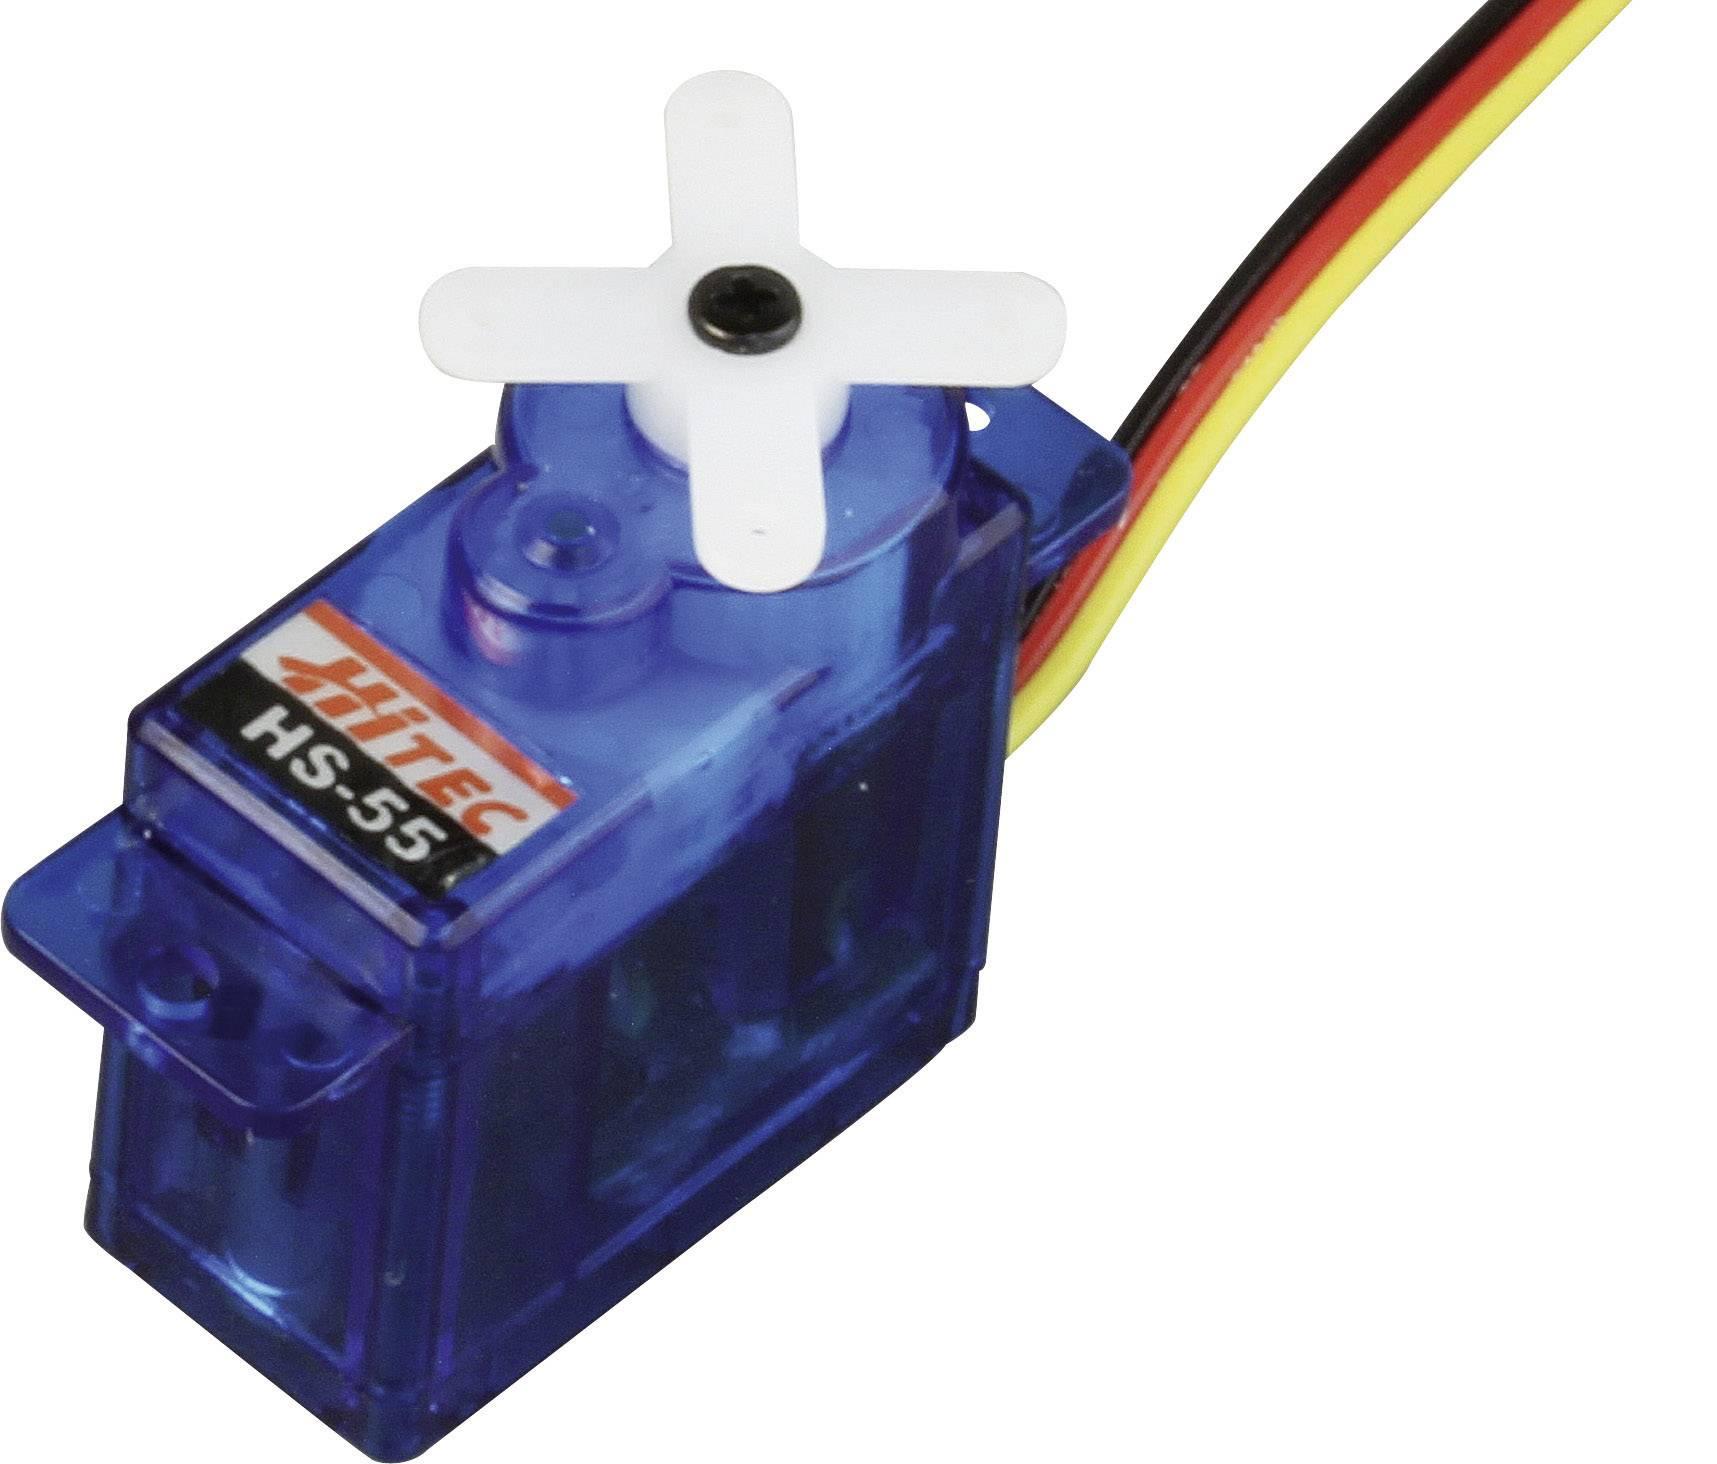 Midi servo Hitec HS-55, JR konektor